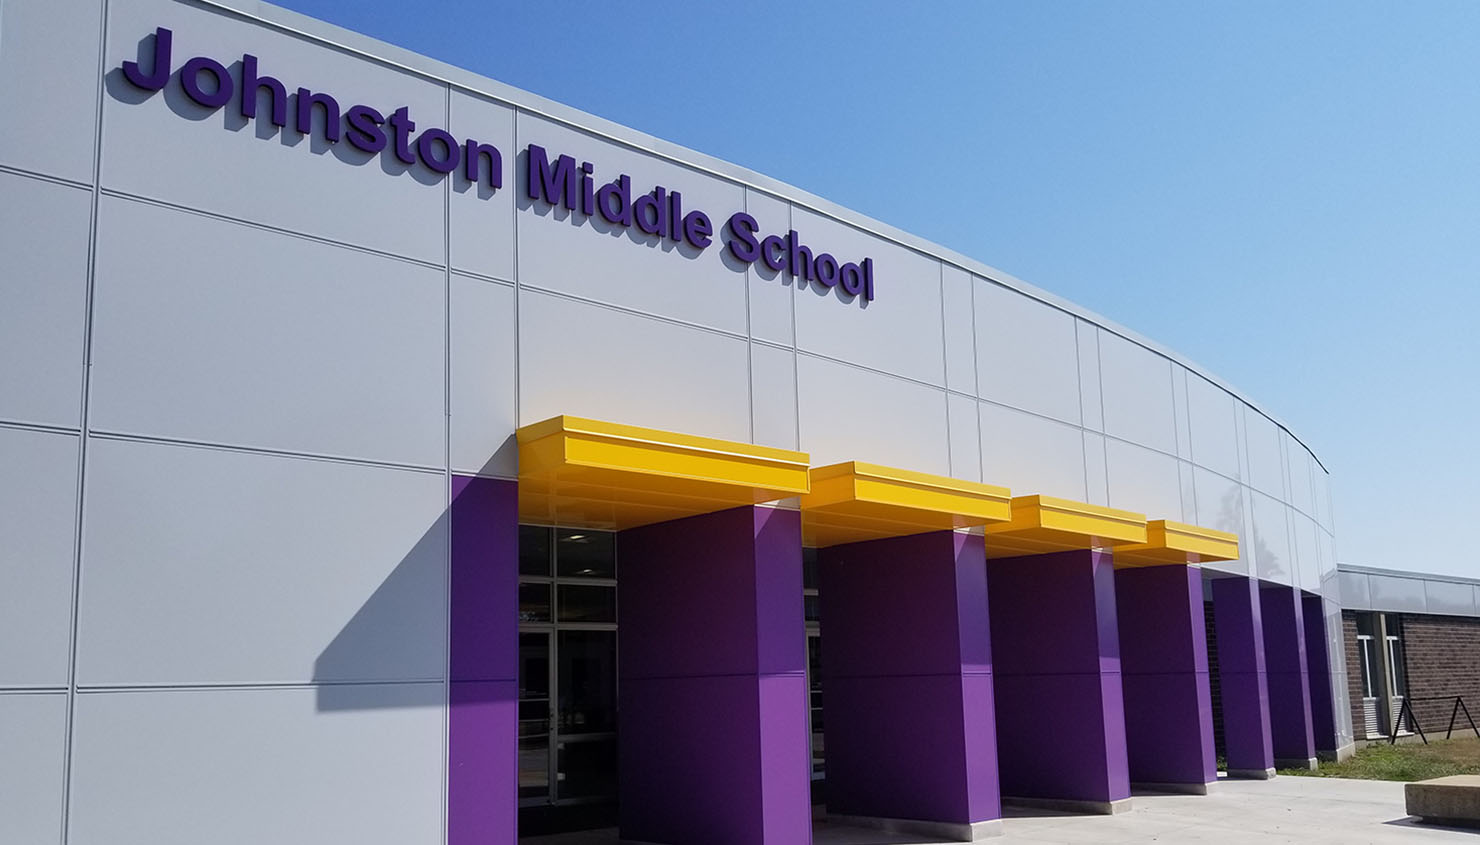 Johnston Middle School